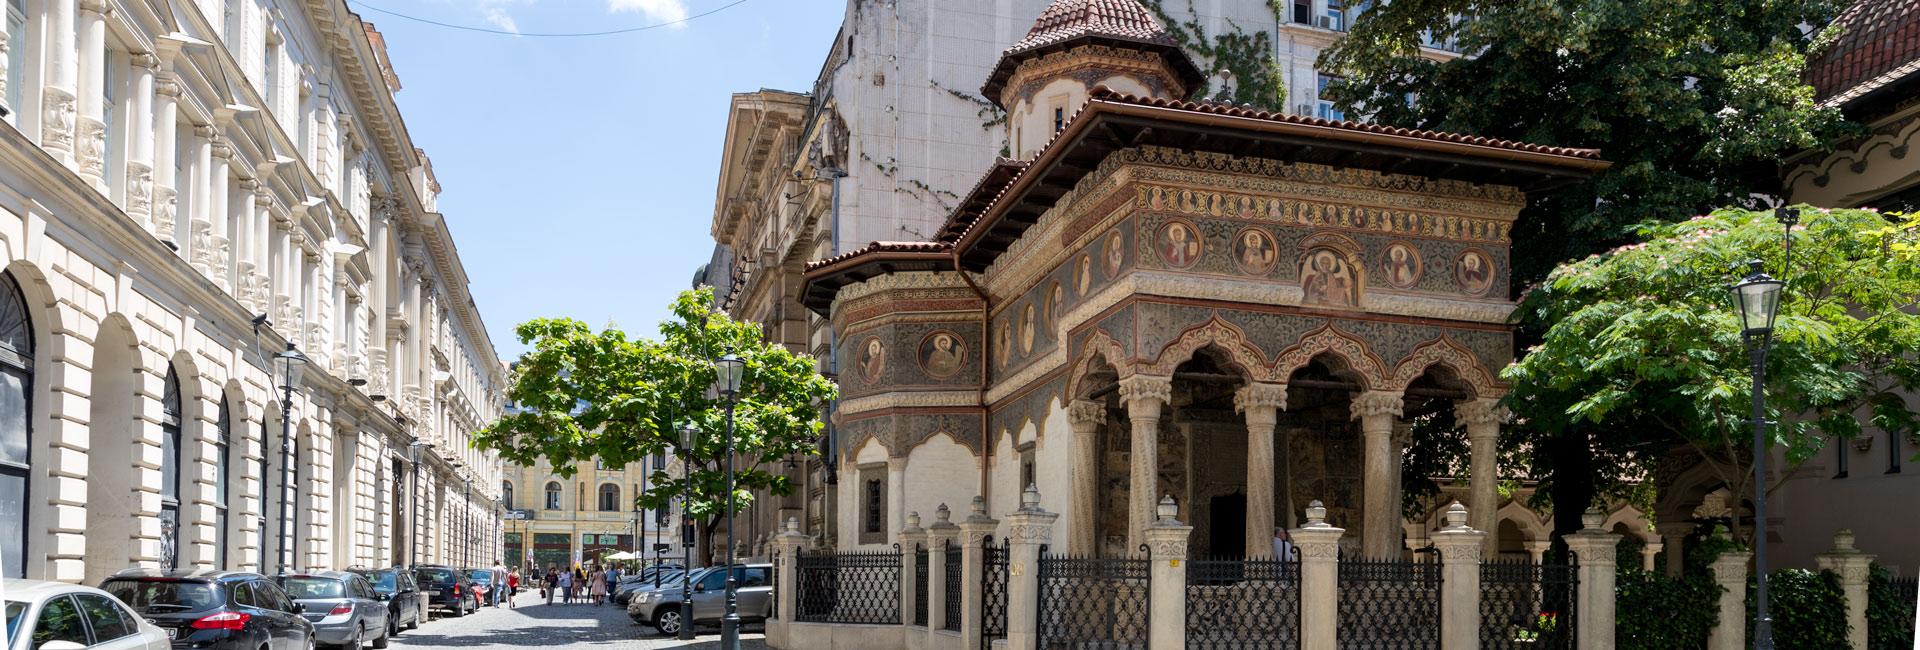 Biserica Stavropoleos pentru-Matricea-Romaneasca-foto-slider 1